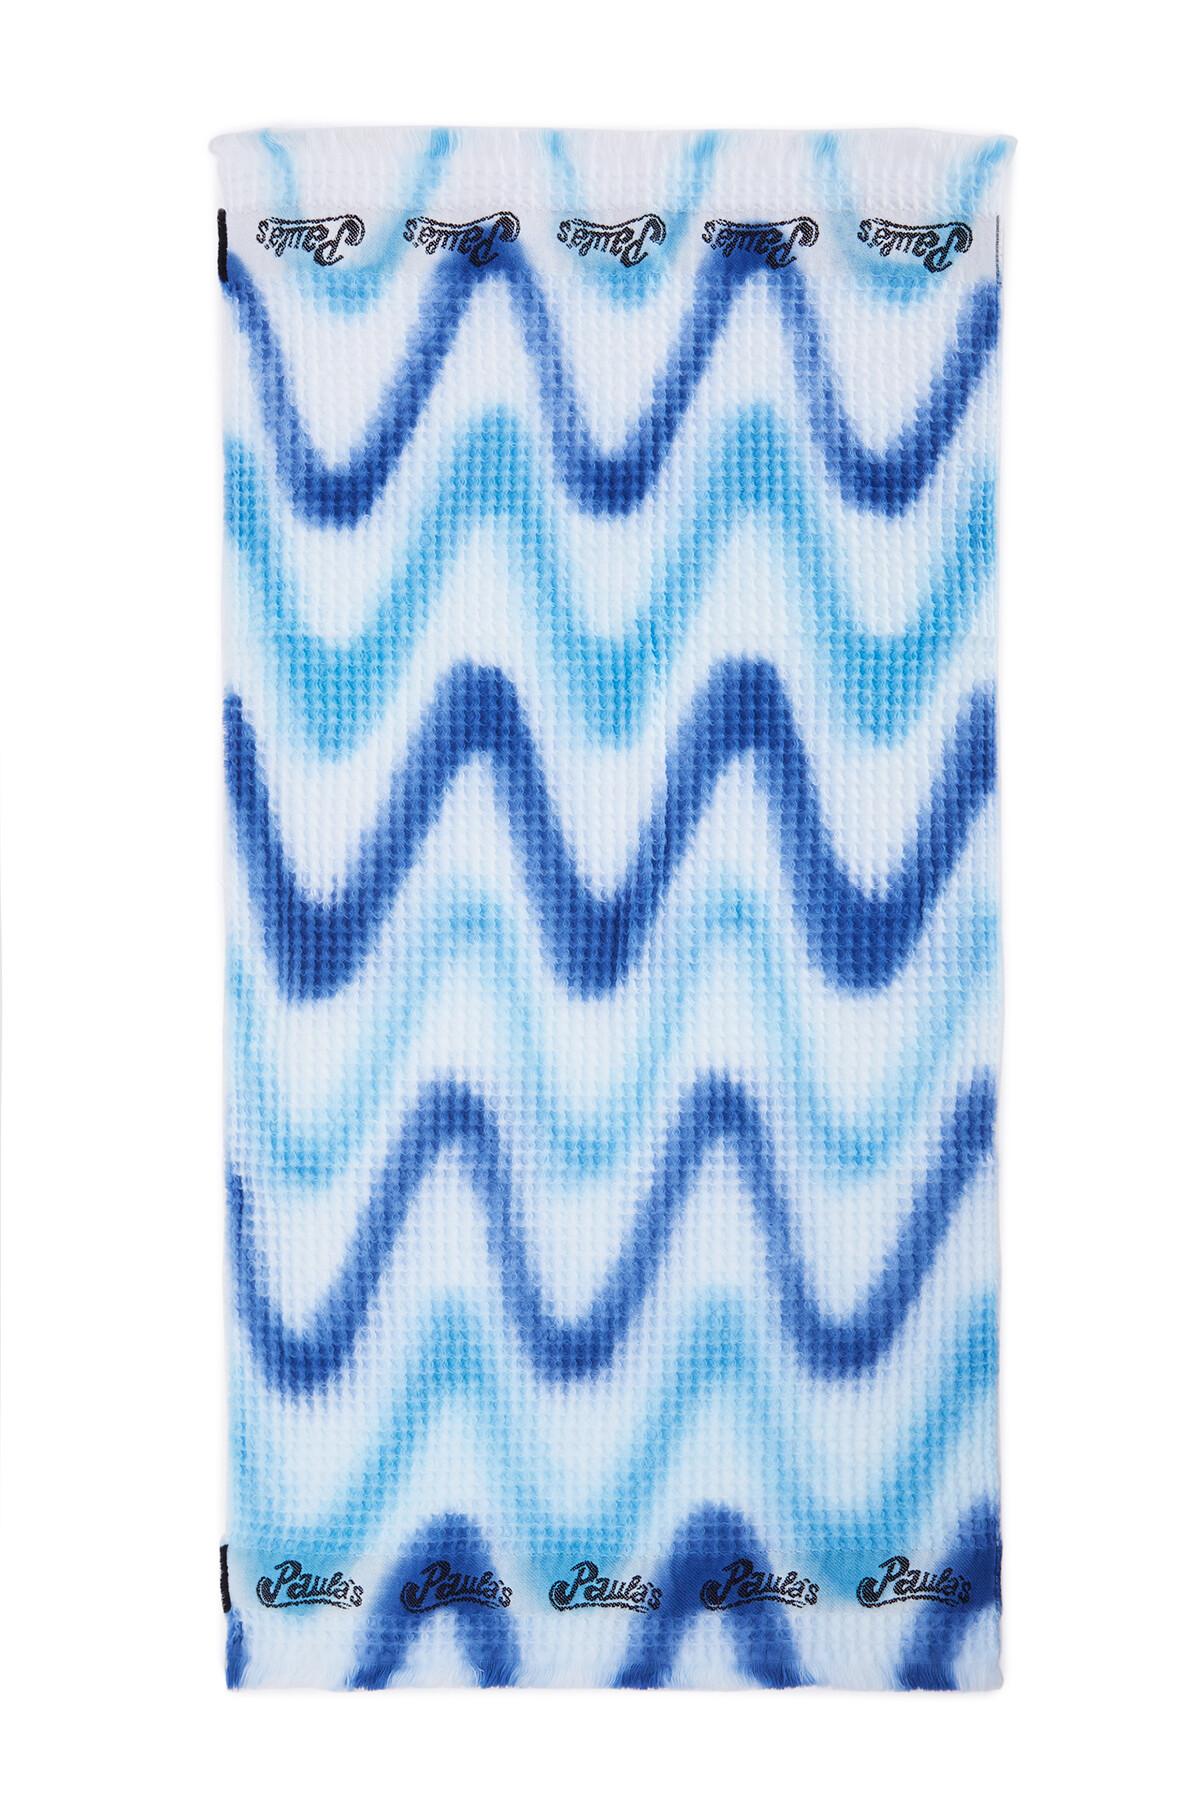 LOEWE 42Cm X 92Cm Waffle Towel In Tie Dye Cotton White/Blue/Navy Blue front